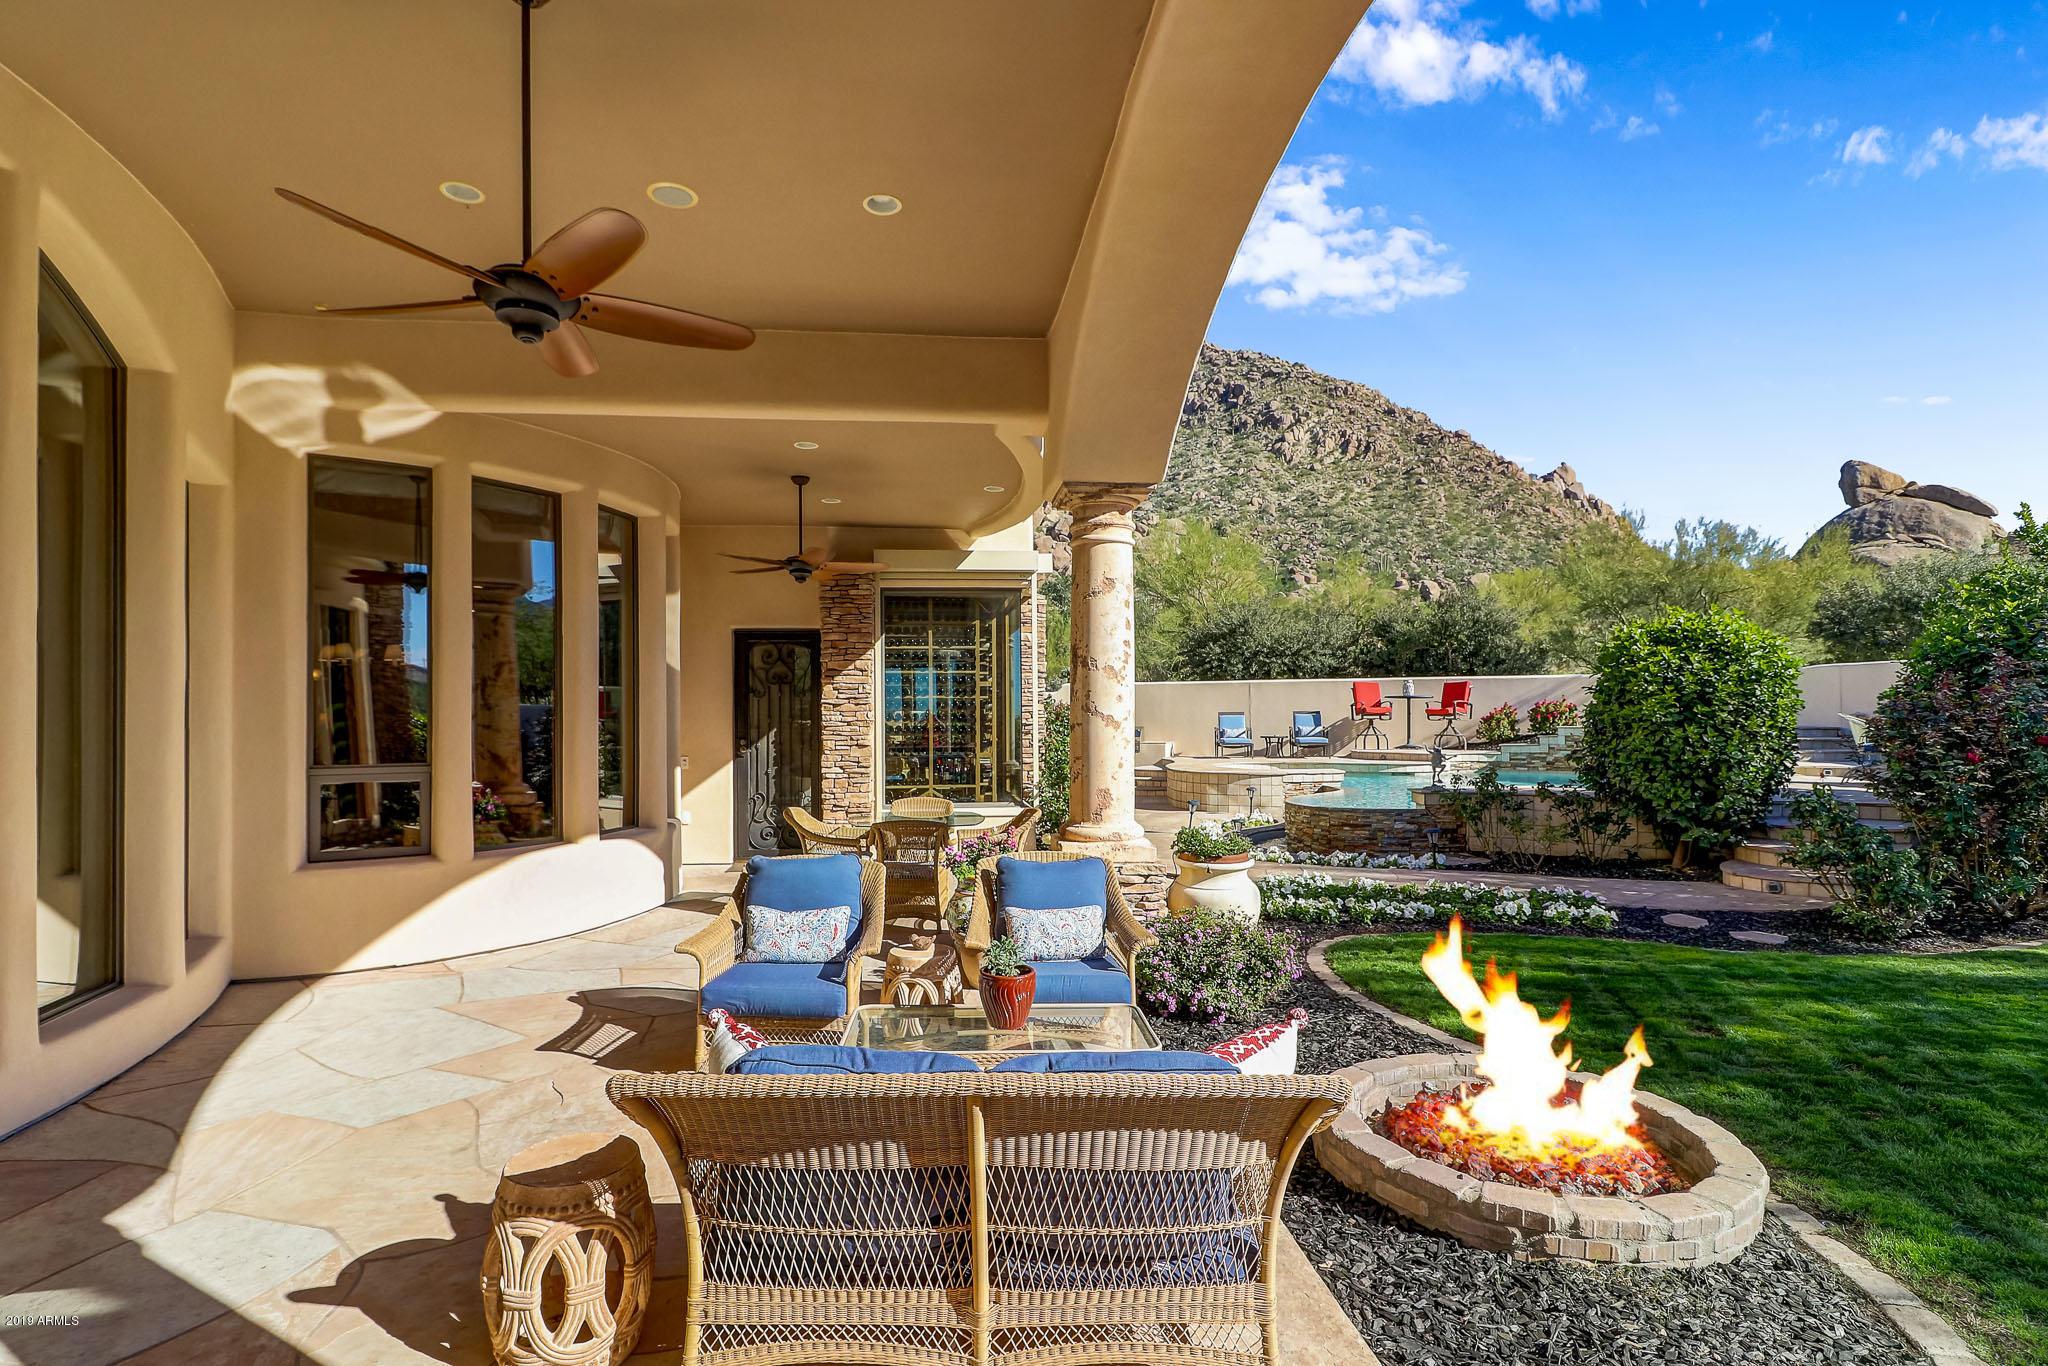 10792 E La Junta Rd Scottsdale, AZ